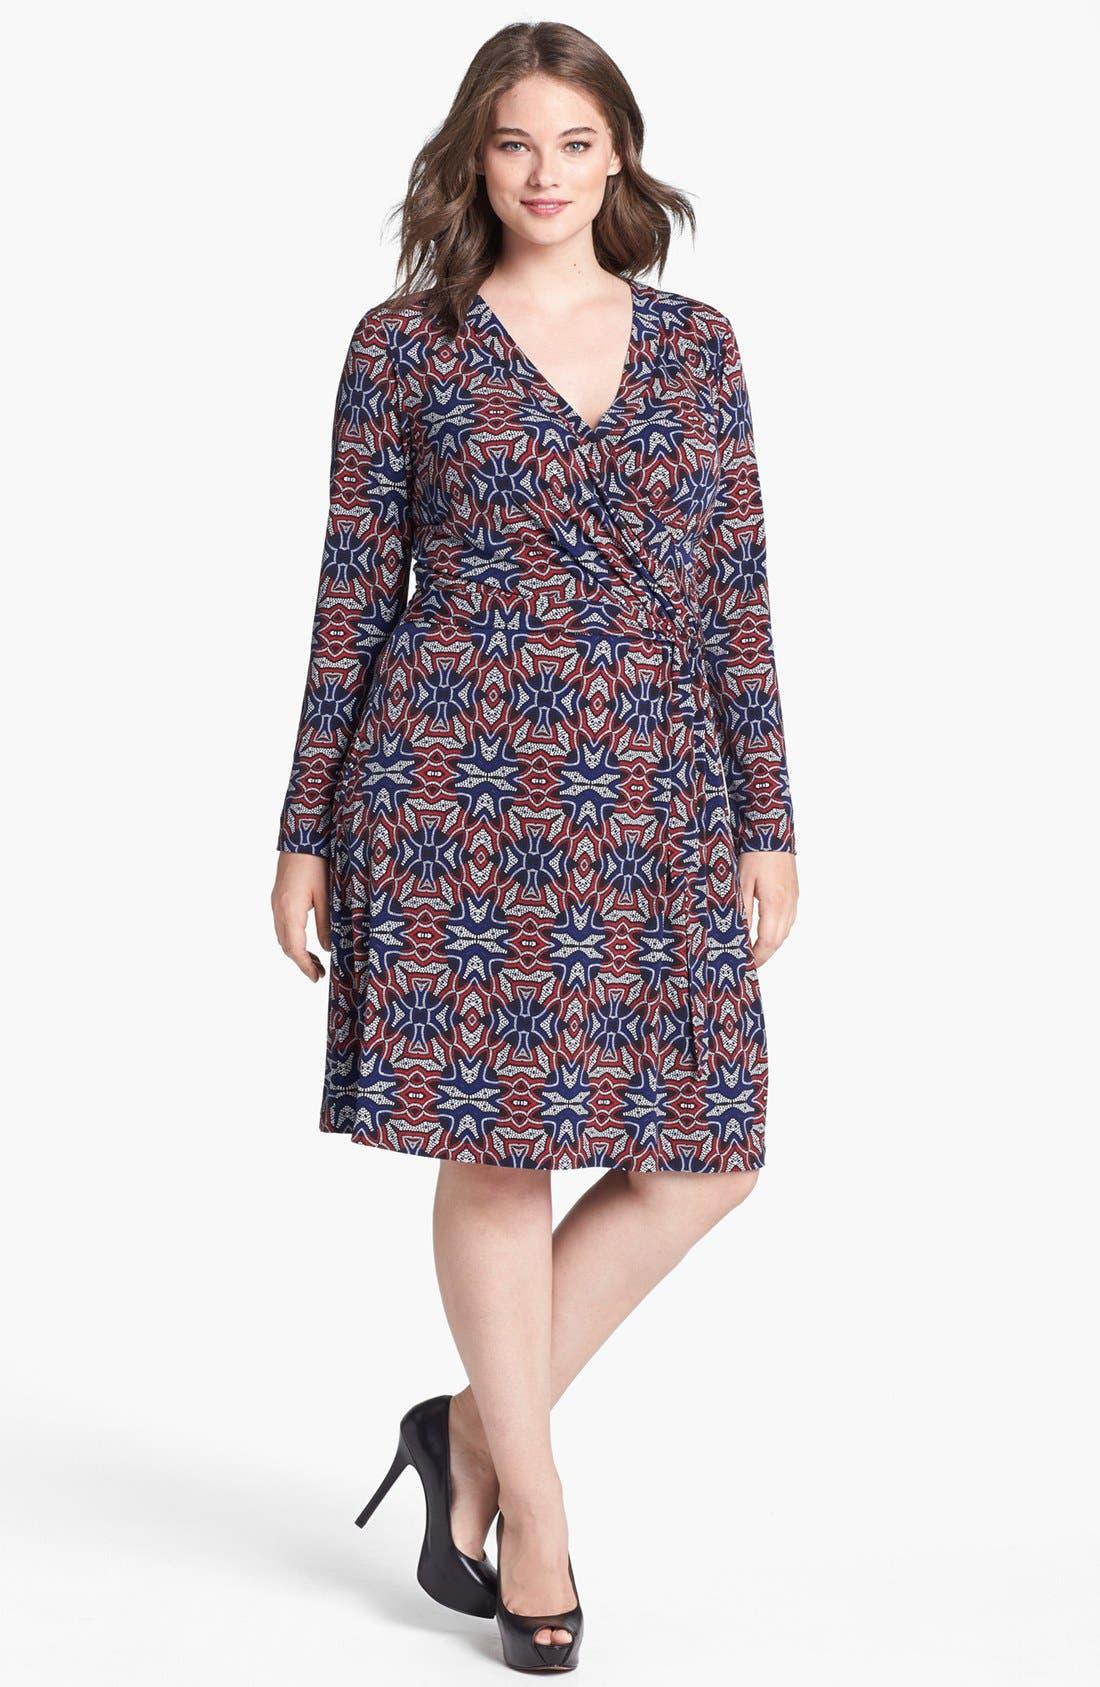 Alternate Image 1 Selected - Anne Klein Print Faux Wrap Dress (Plus Size)